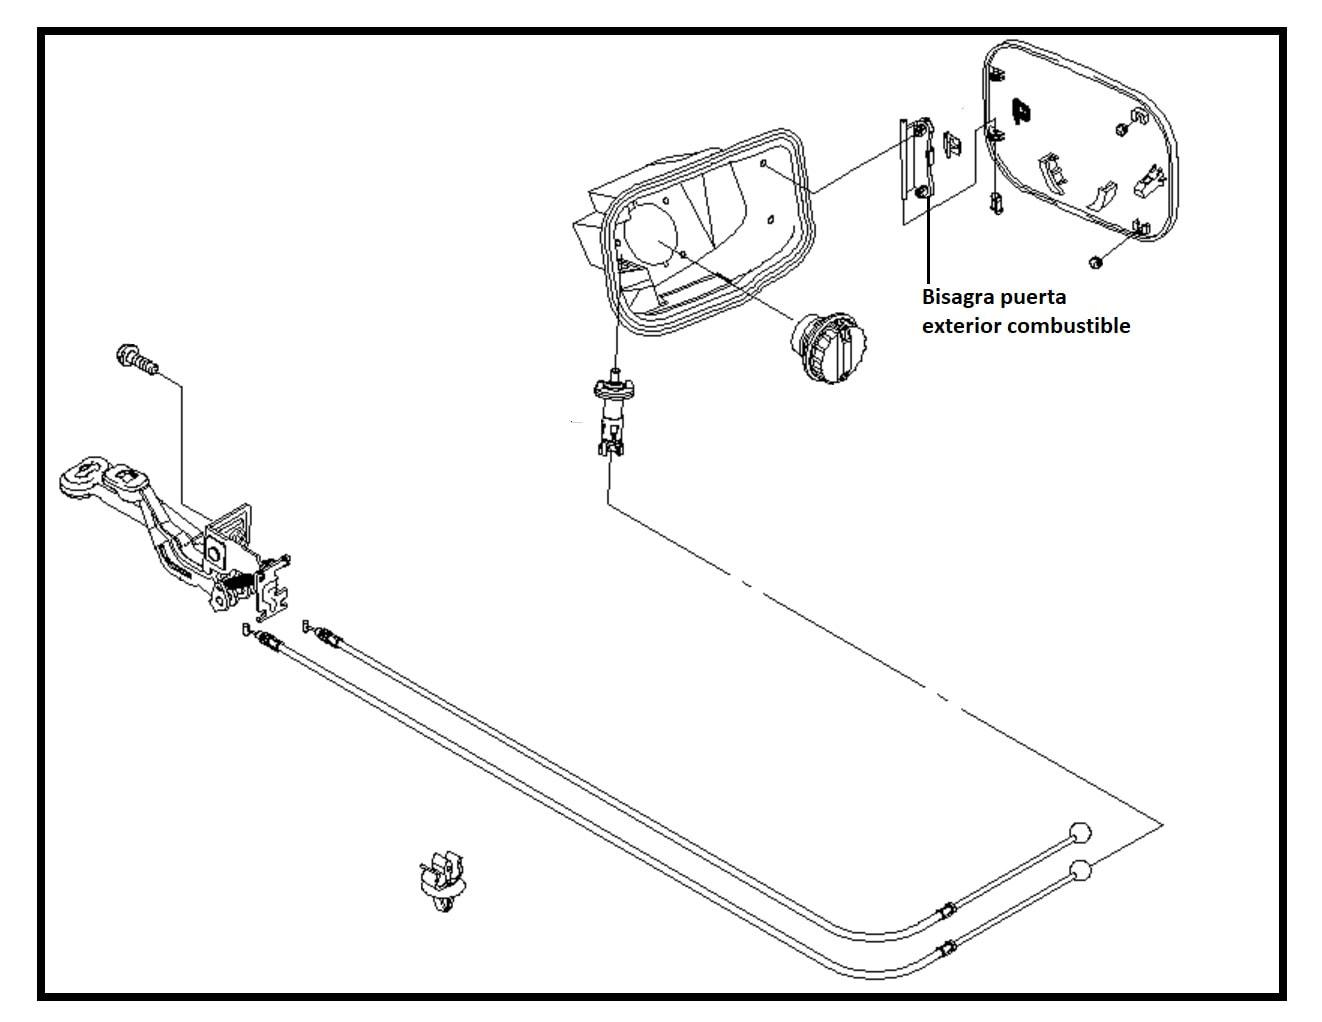 Bisagra Tapa Exterior Tanque Combustible Chevrolet Aveo